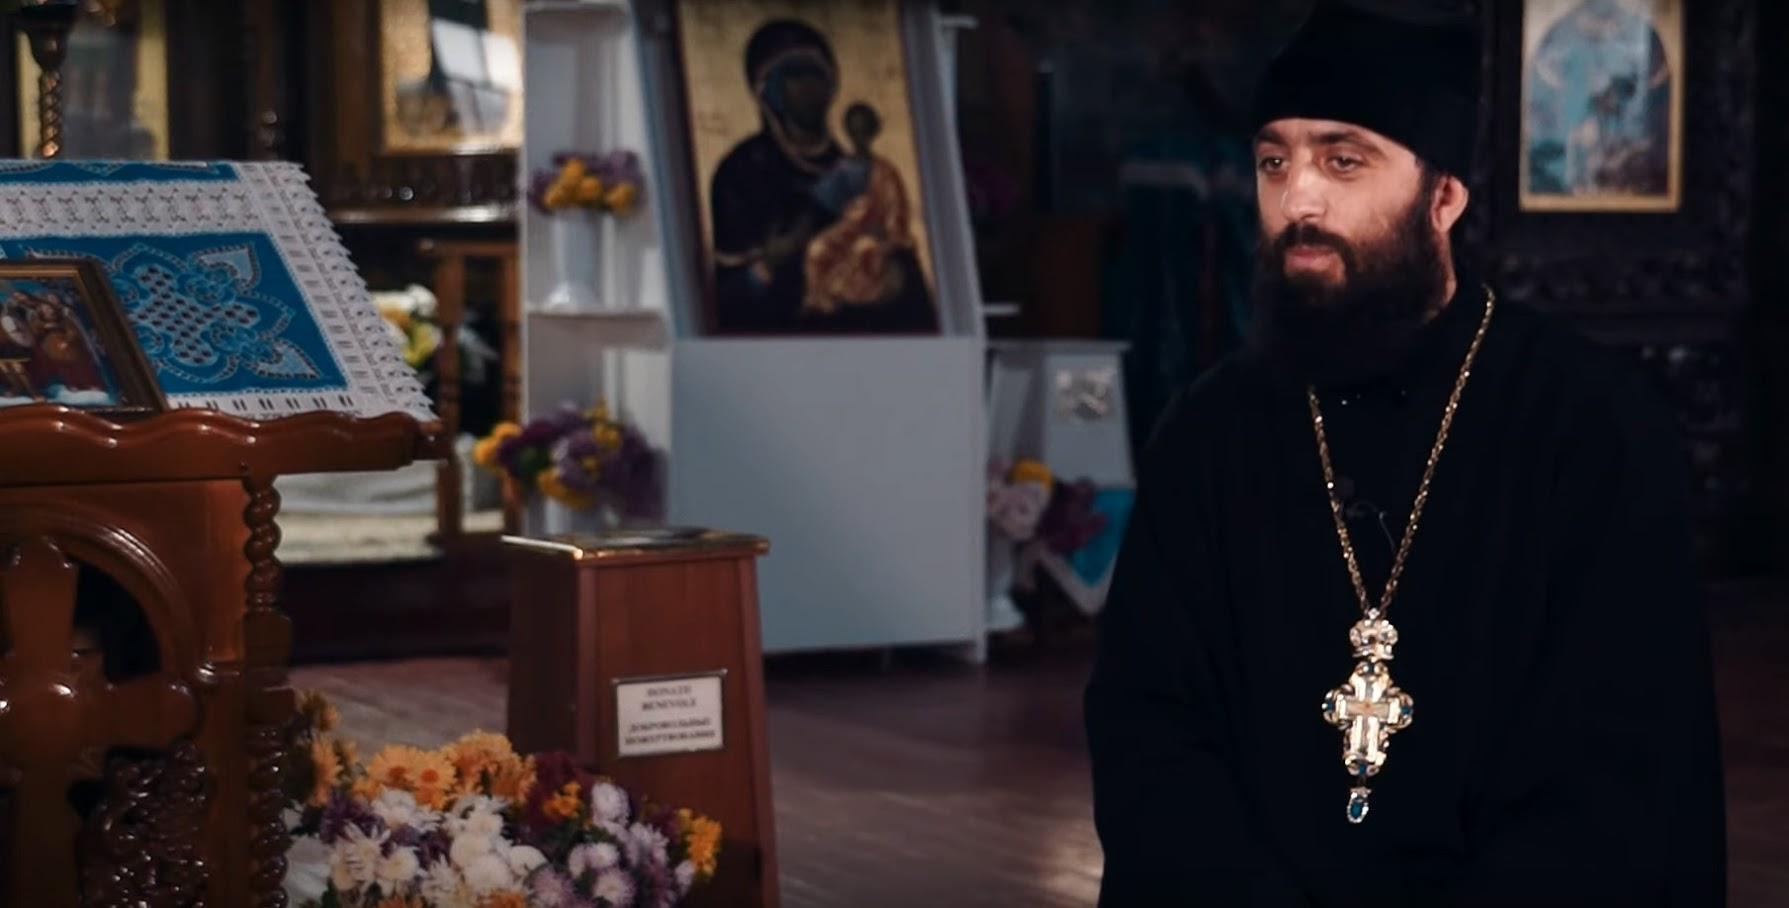 (ВИДЕО) Прот. Александр Дереволков в передачи на NTS беседы о православии